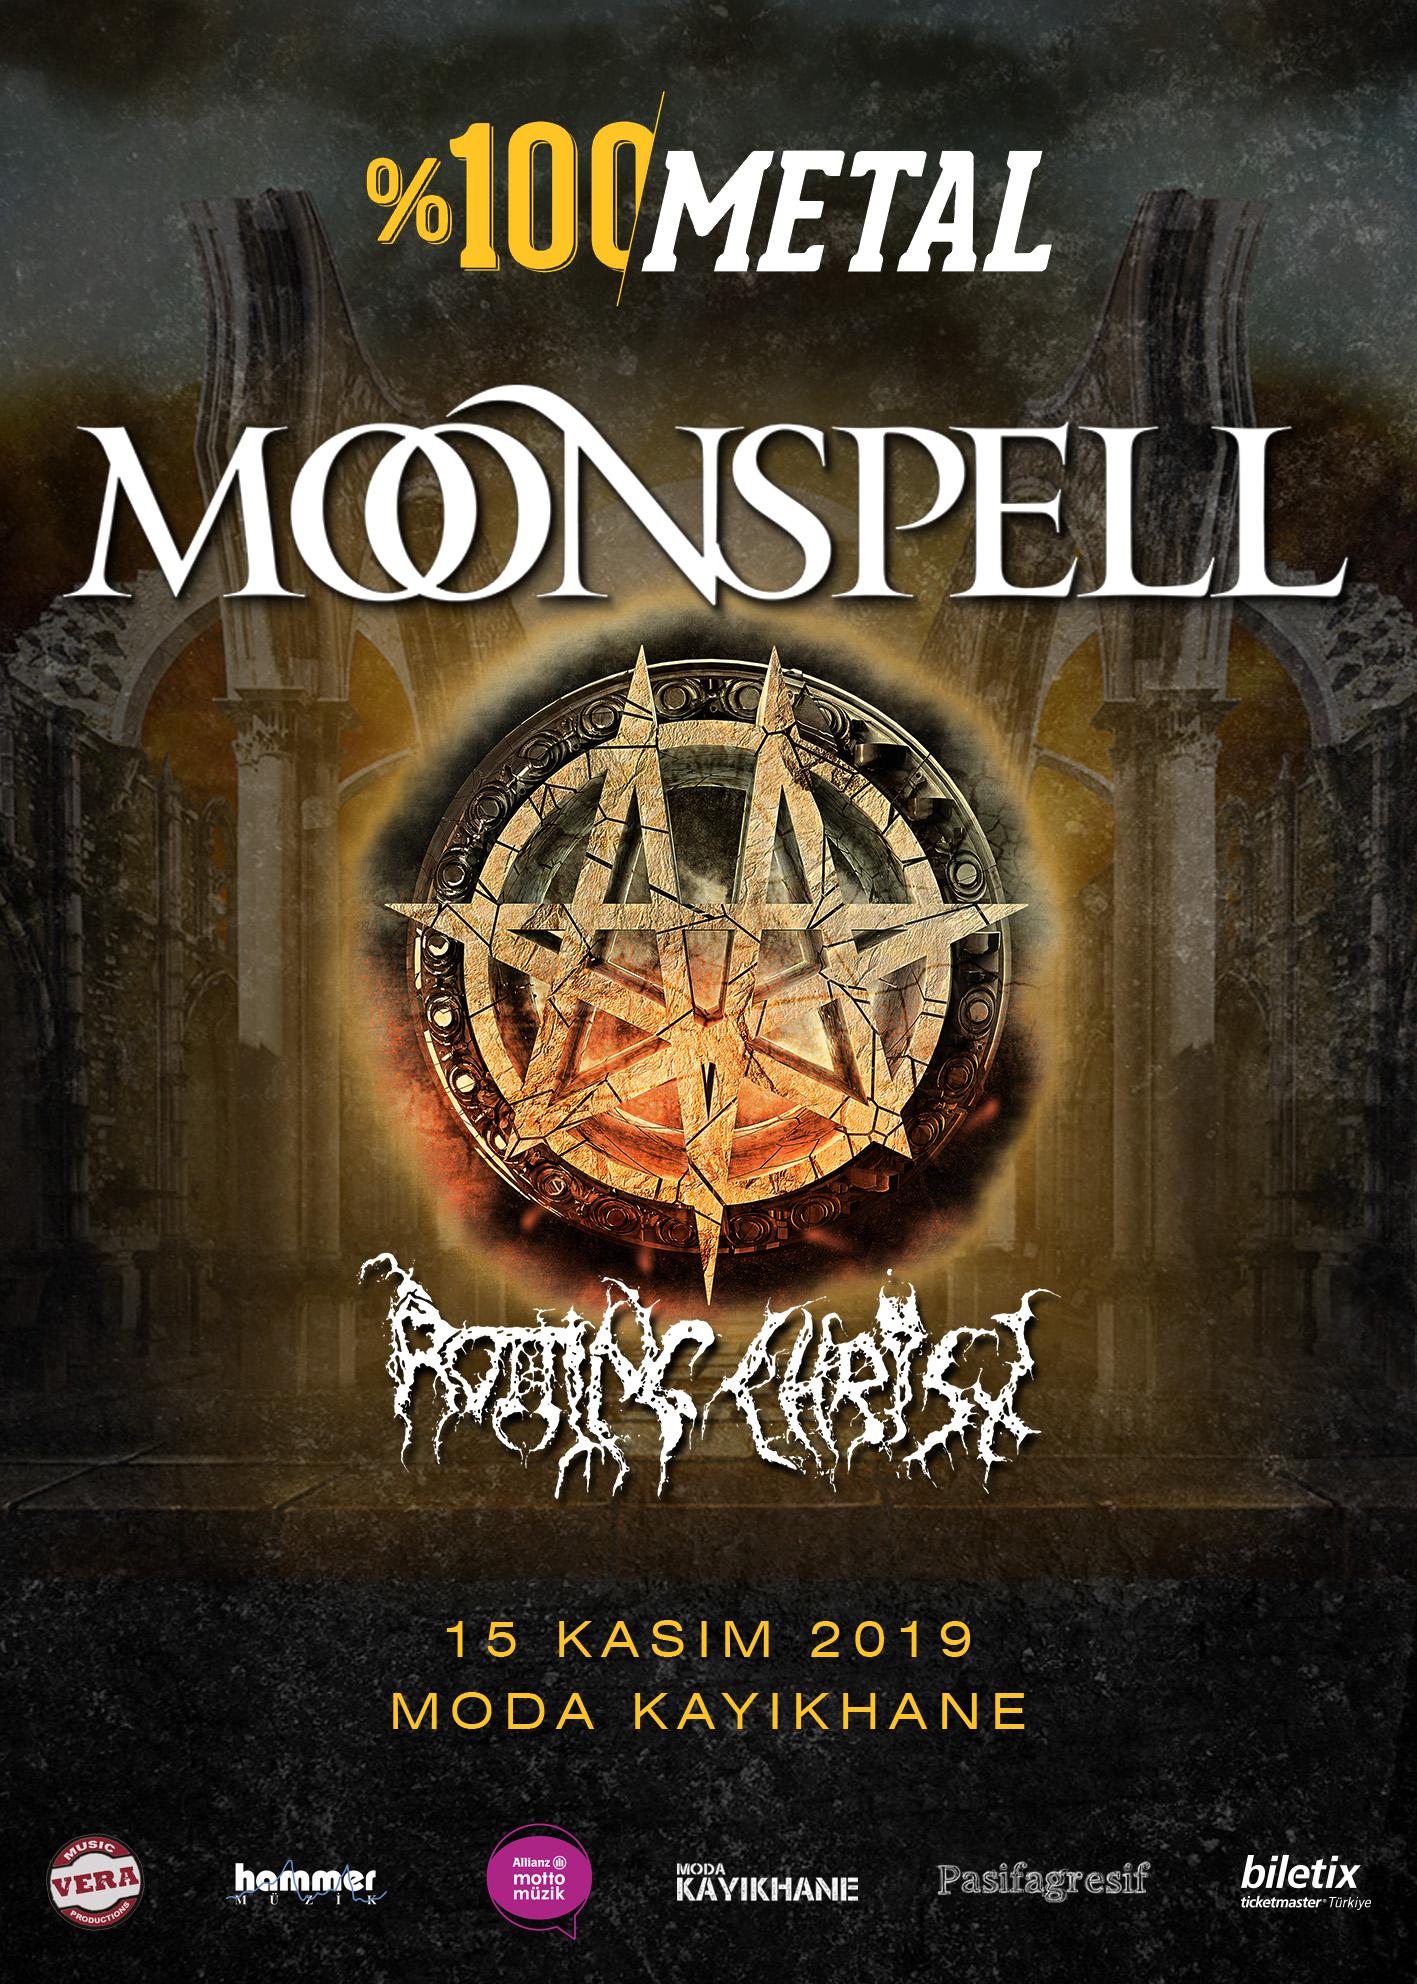 Moonspell, Rotting Christ